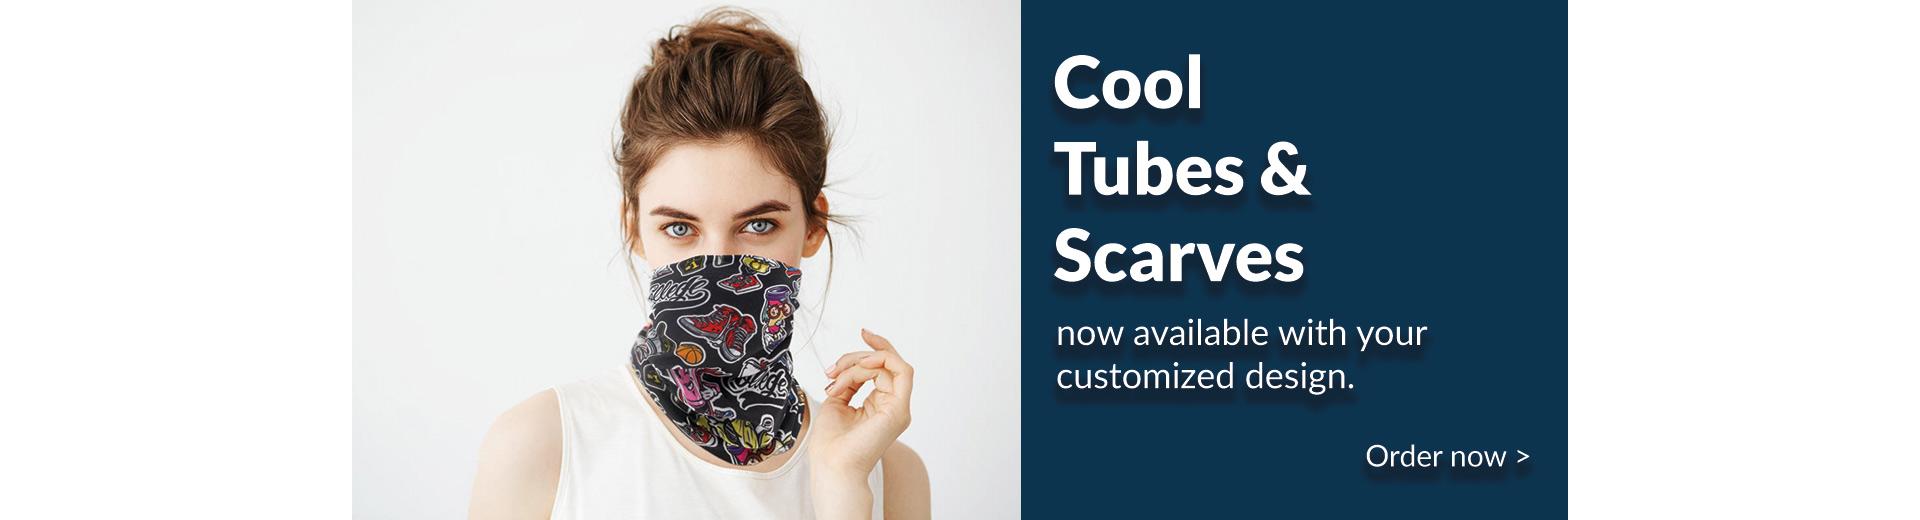 Scarf_tubes_102020